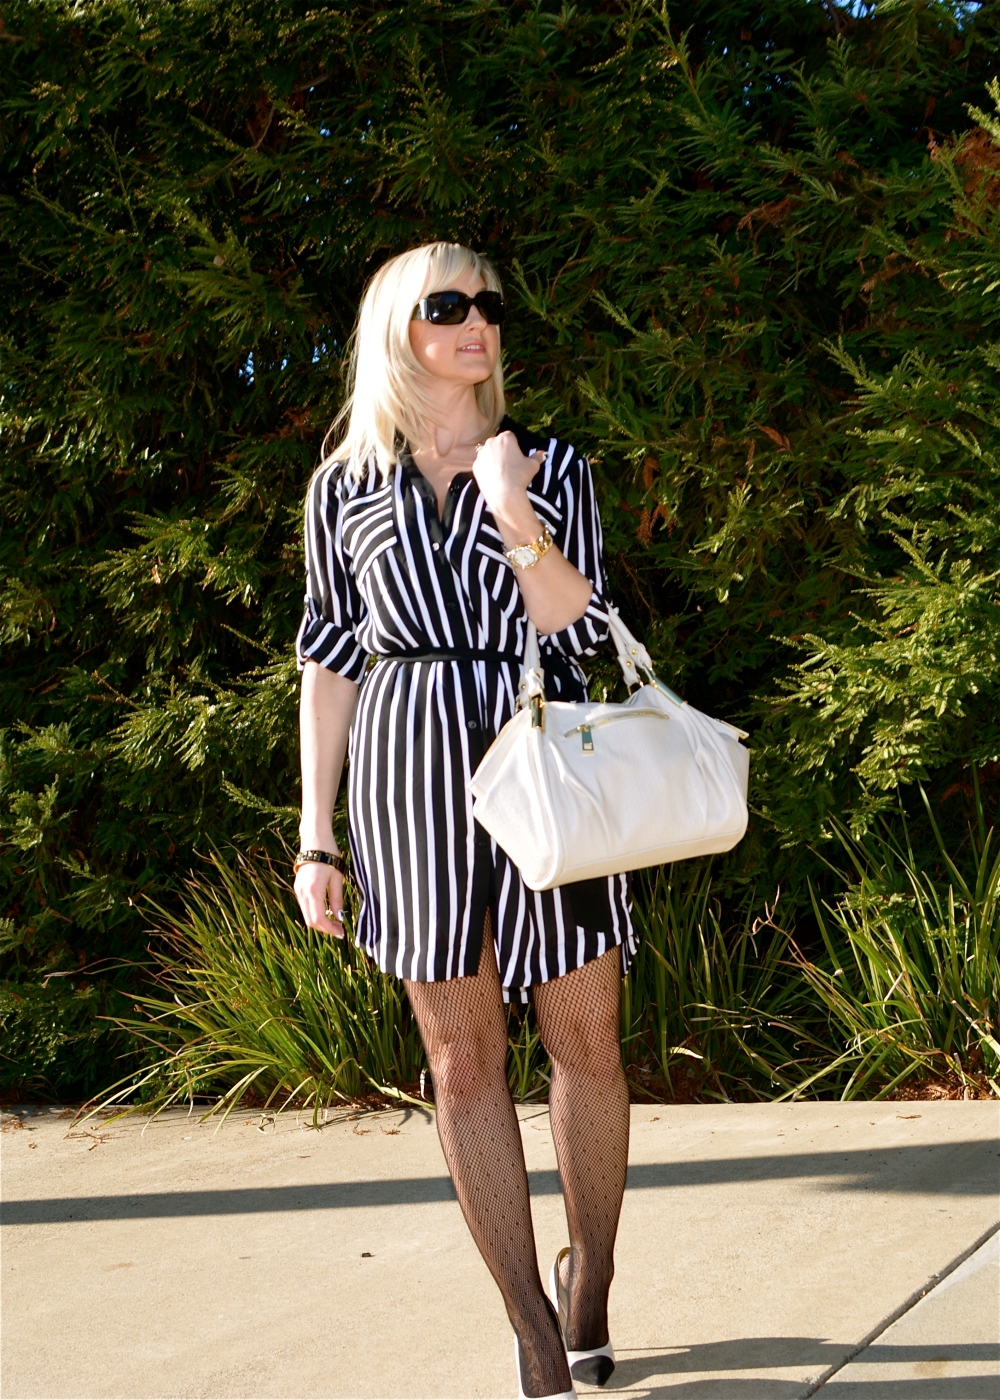 Wear and Share Wednesday mark. Avon Classic Hit Handbag